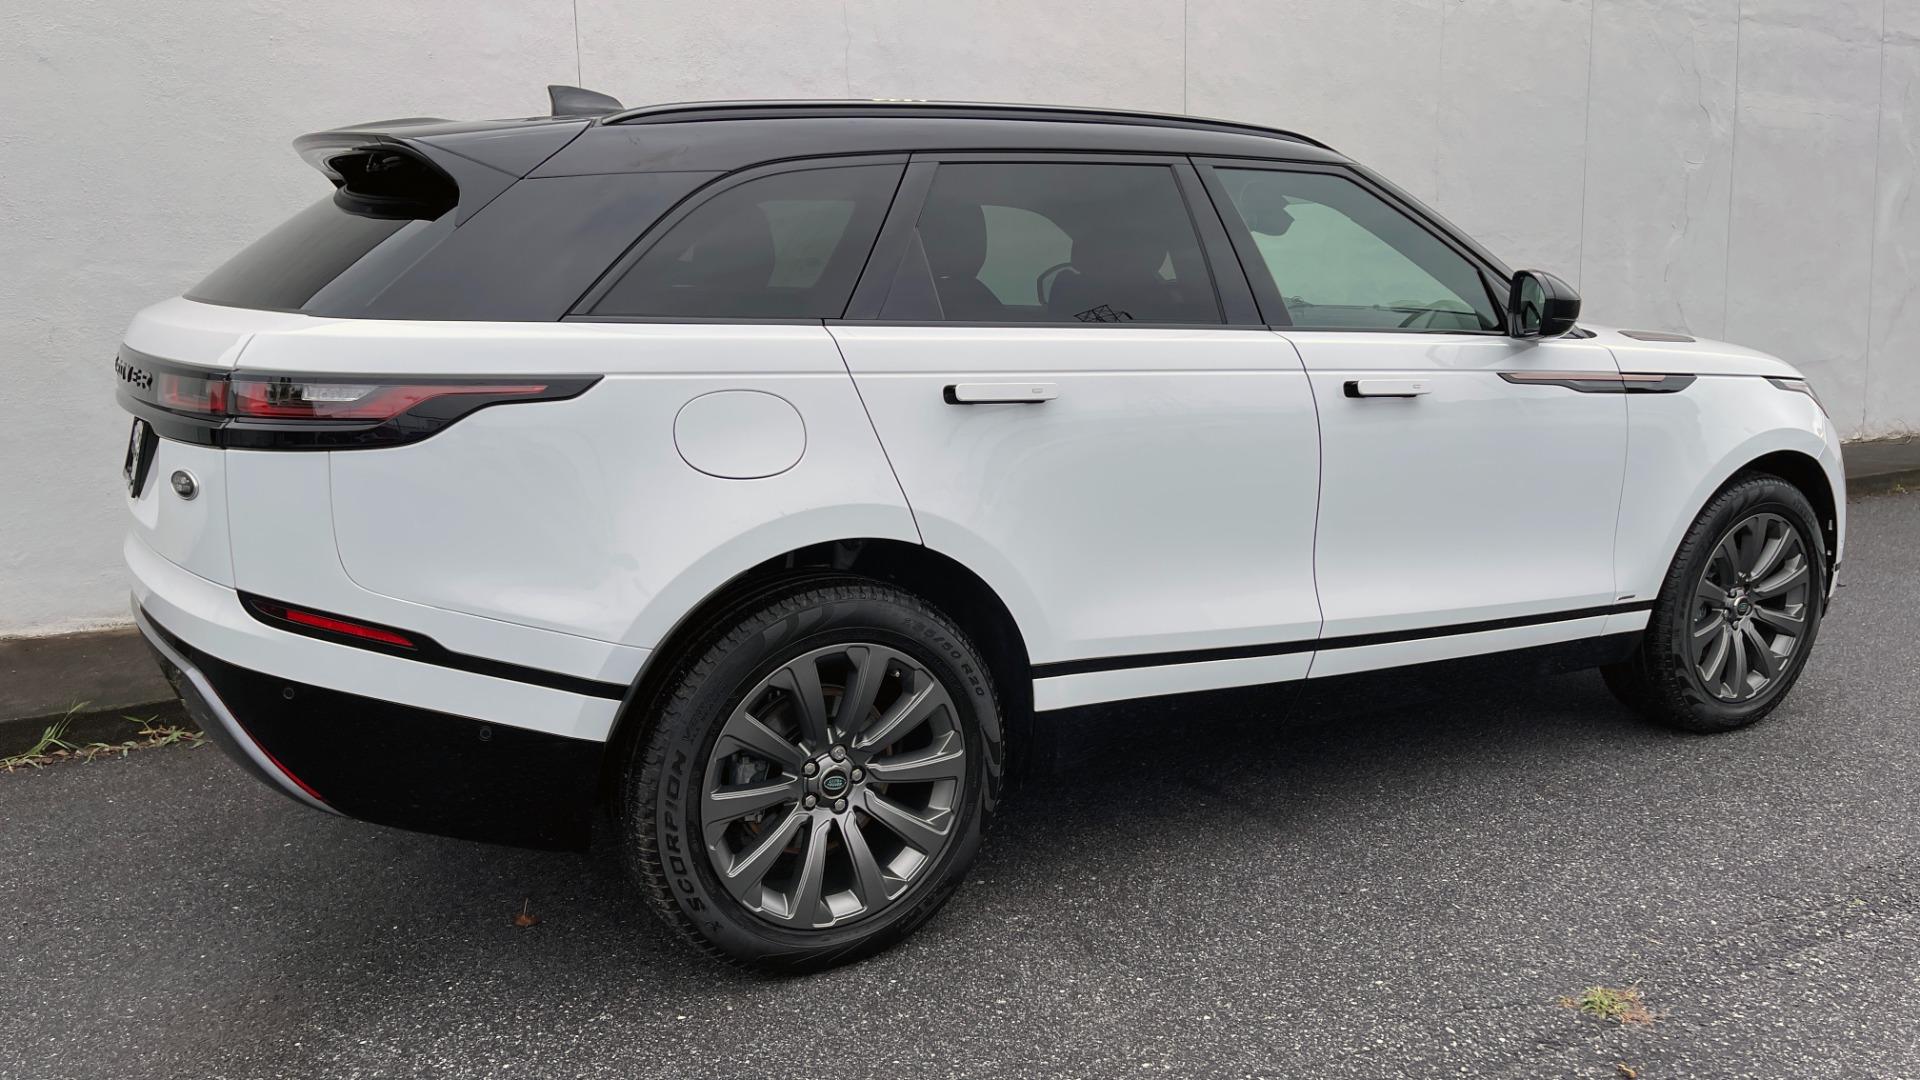 Used 2018 Land Rover RANGE ROVER VELAR R-DYNAMIC SE / NAV / PREM / MERIDIAN / SUNROOF / REARVIEW for sale $54,995 at Formula Imports in Charlotte NC 28227 6